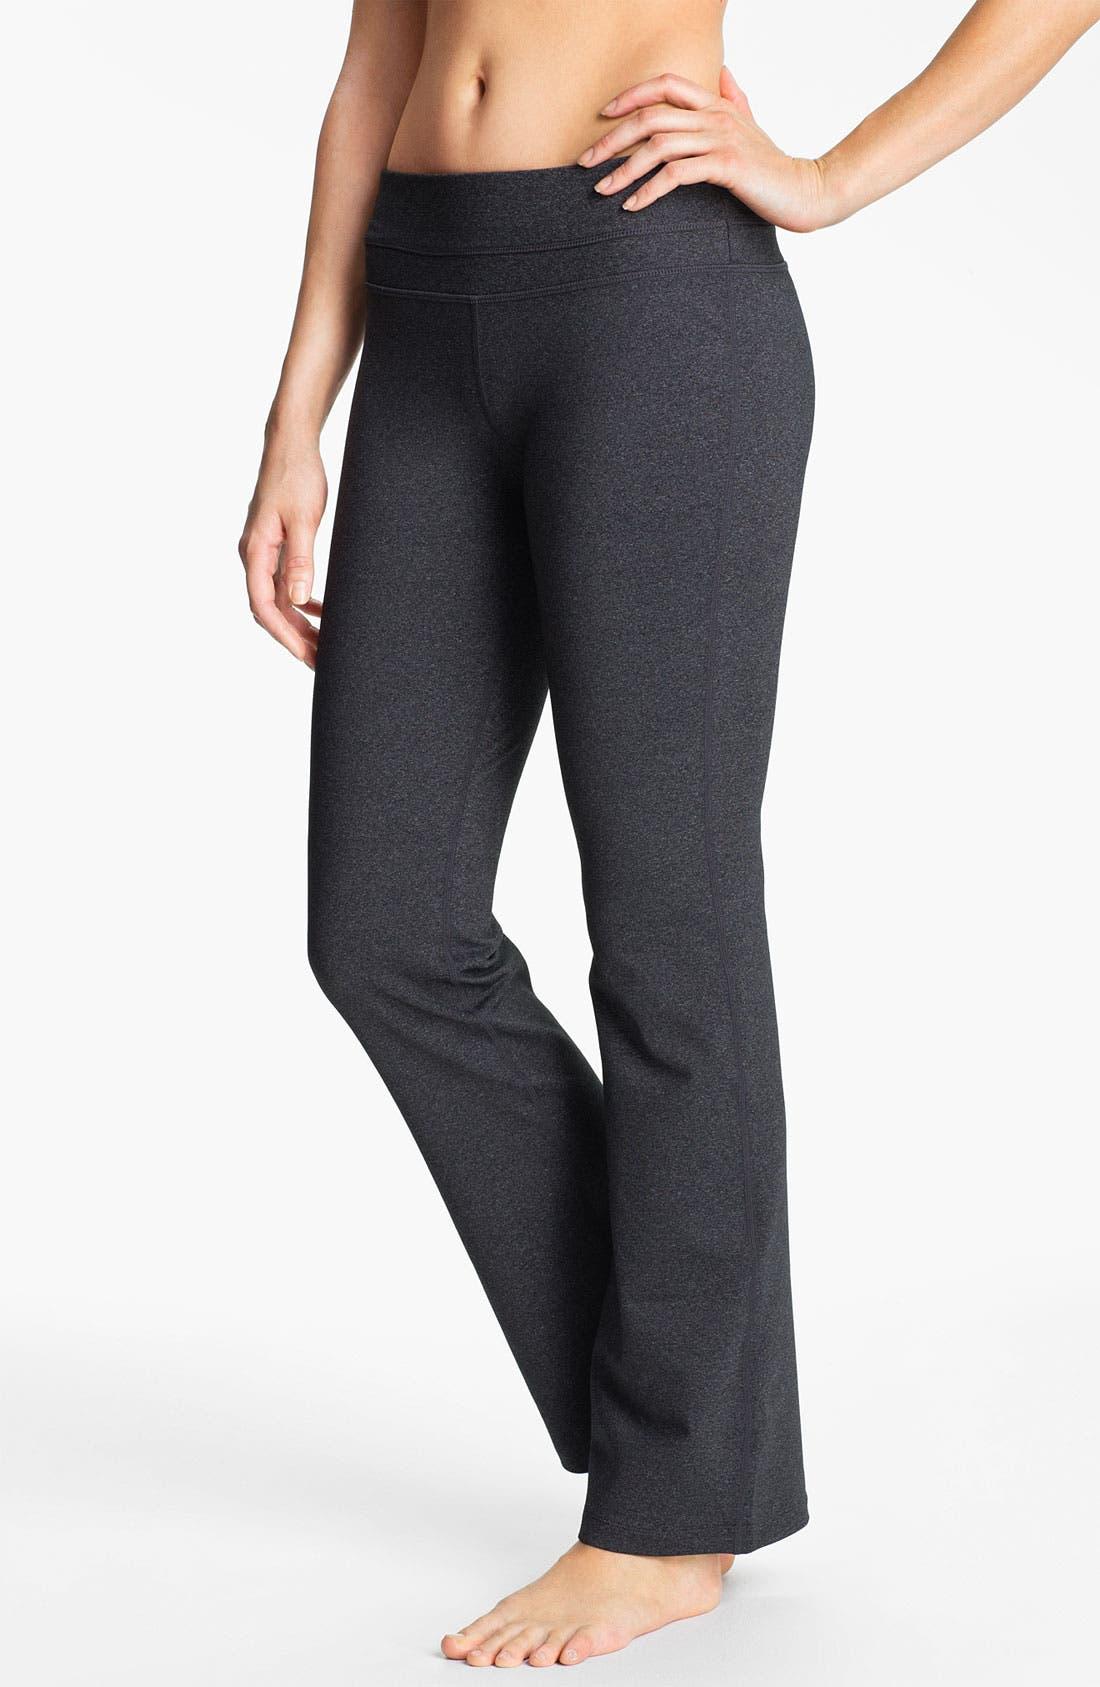 Alternate Image 1 Selected - prAna 'Audrey' Pants